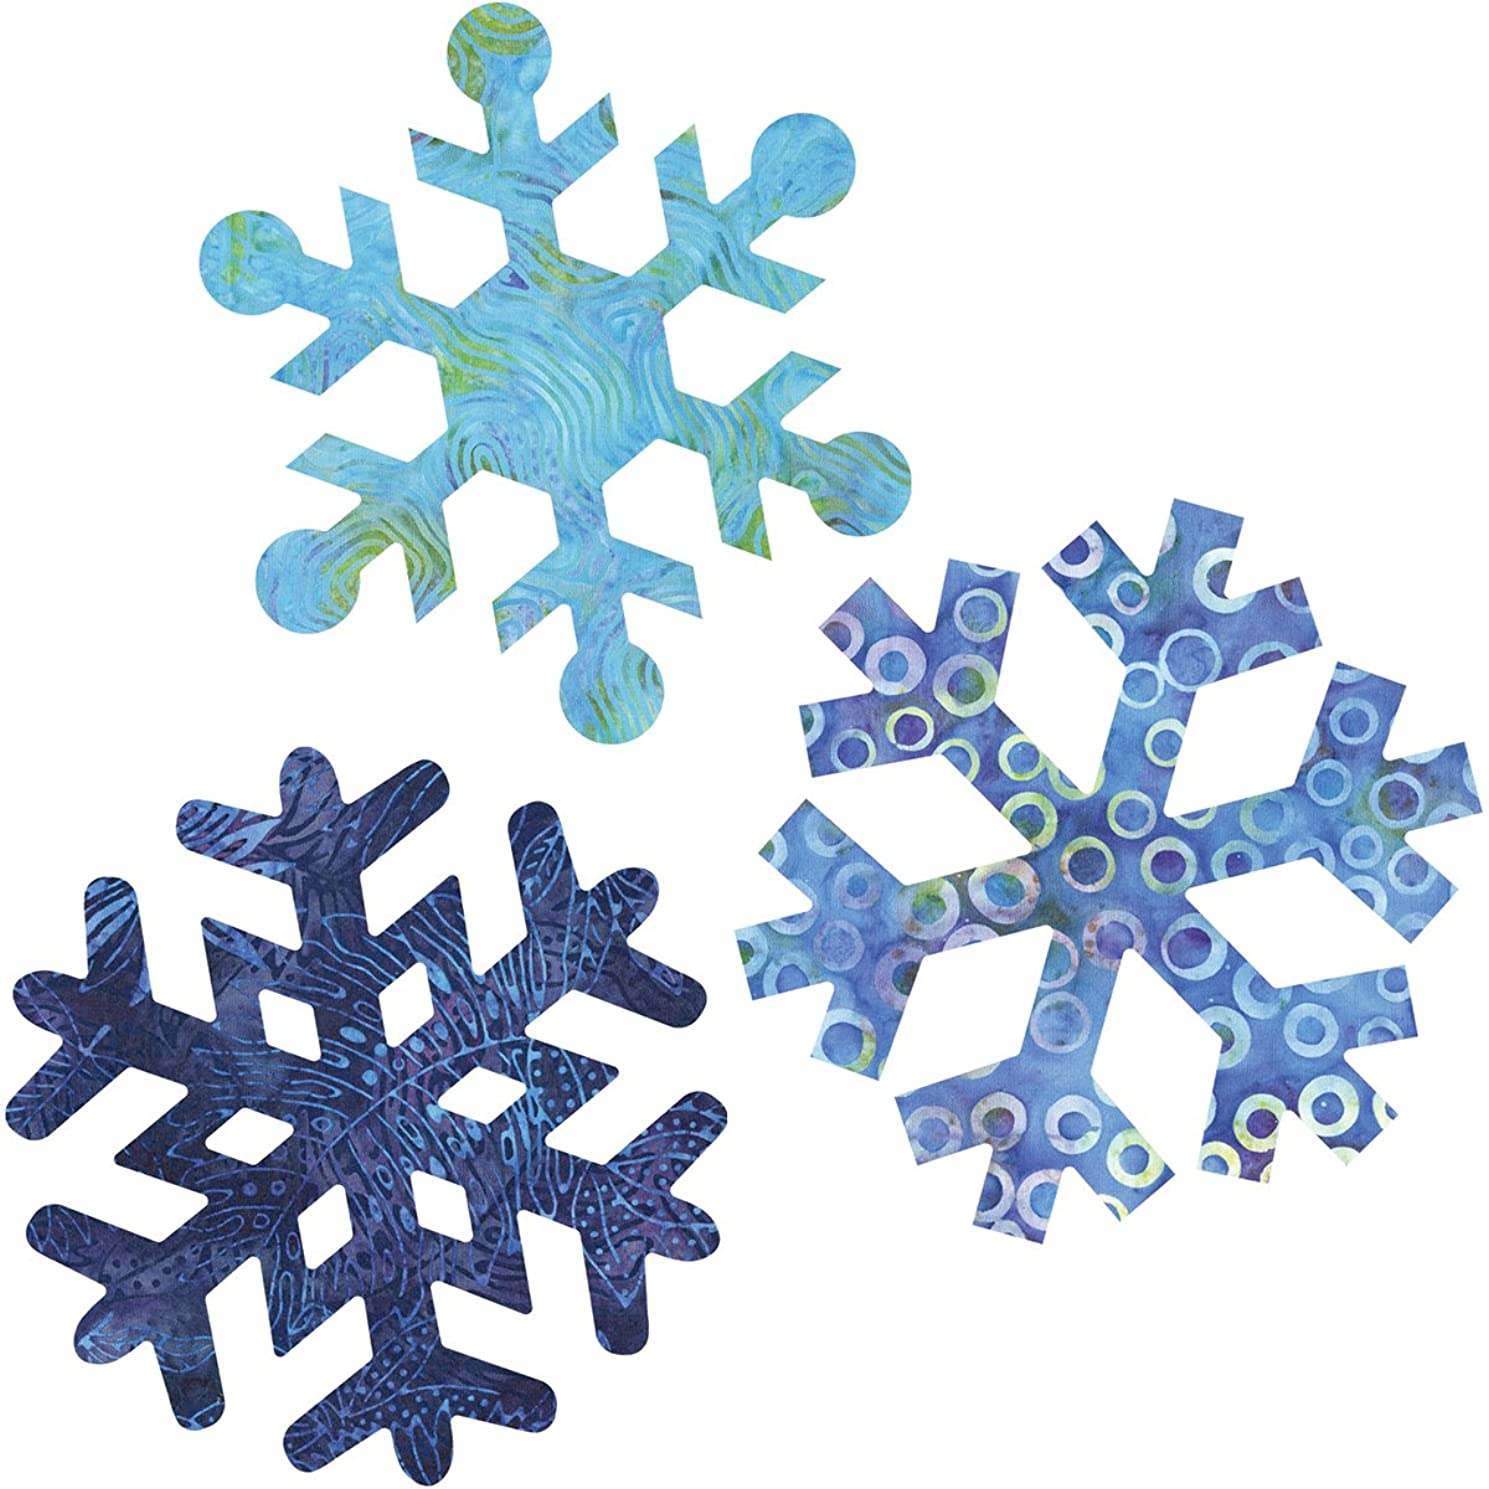 AccuQuilt GO! Fabric Cutting Dies, Snowflakes 7-Inch